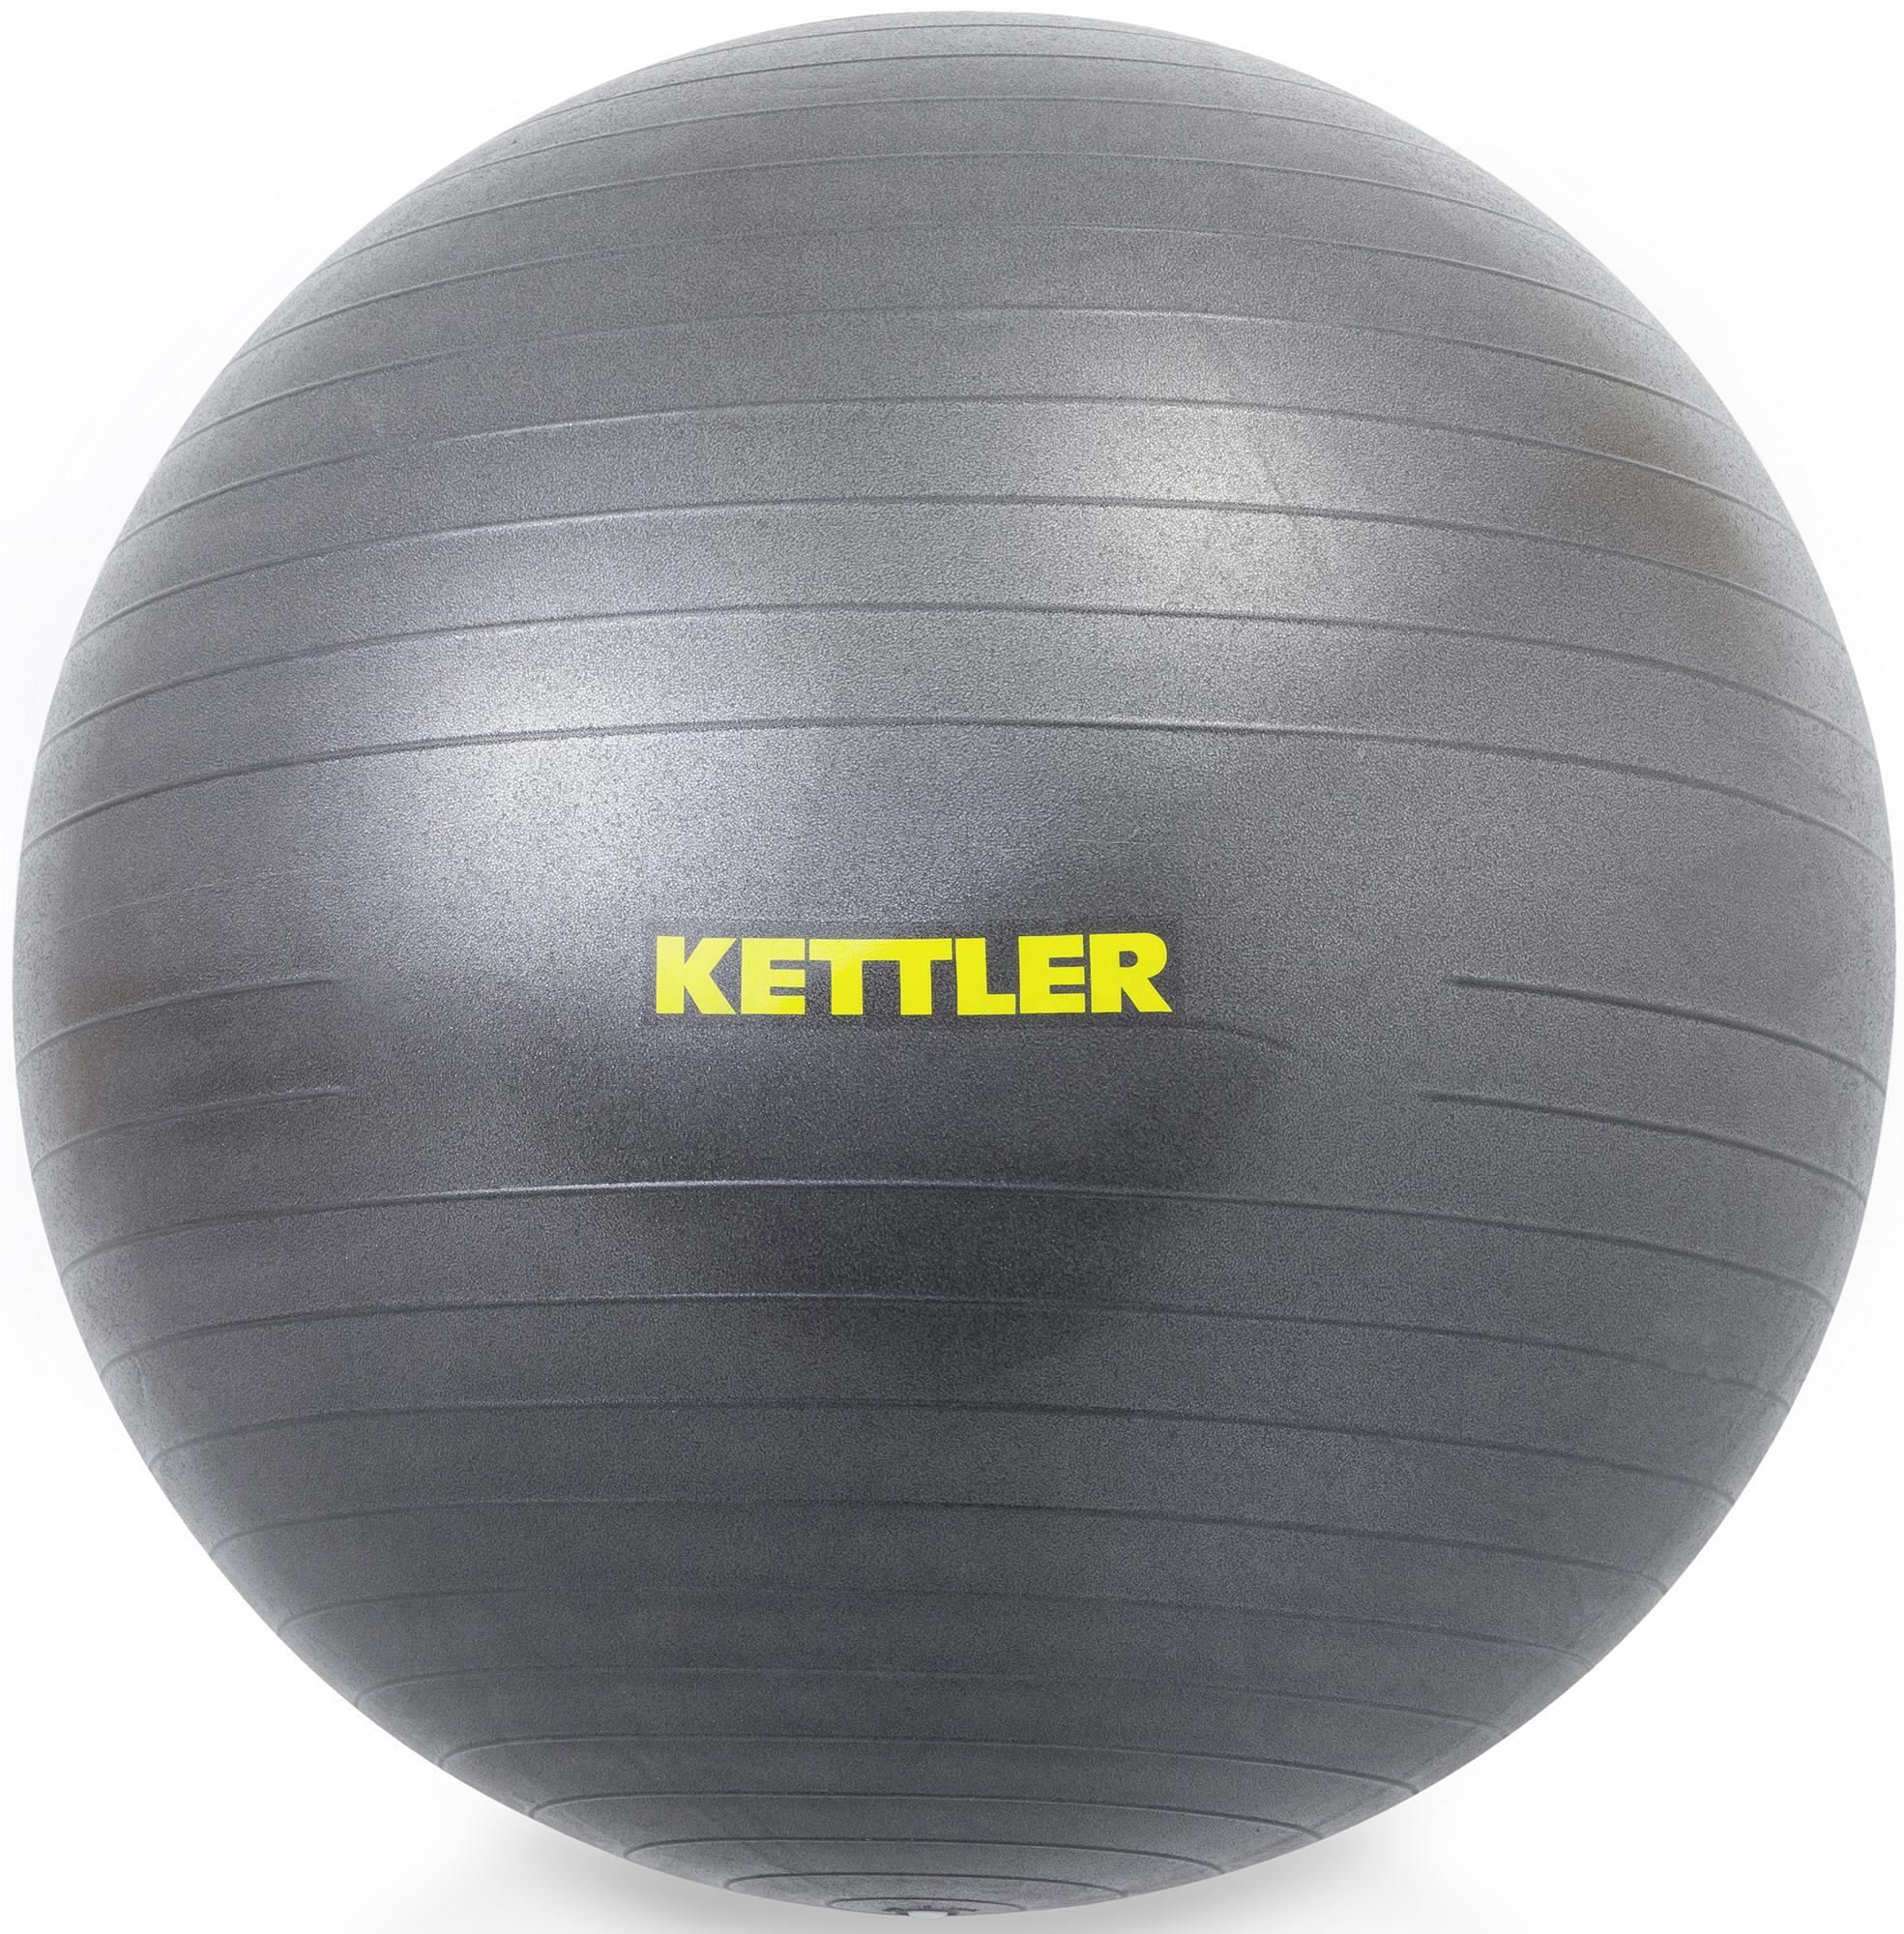 Kettler Мяч гимнастический Kettler, 75 см перчатки для фитнеса мужские kettler basic kettler